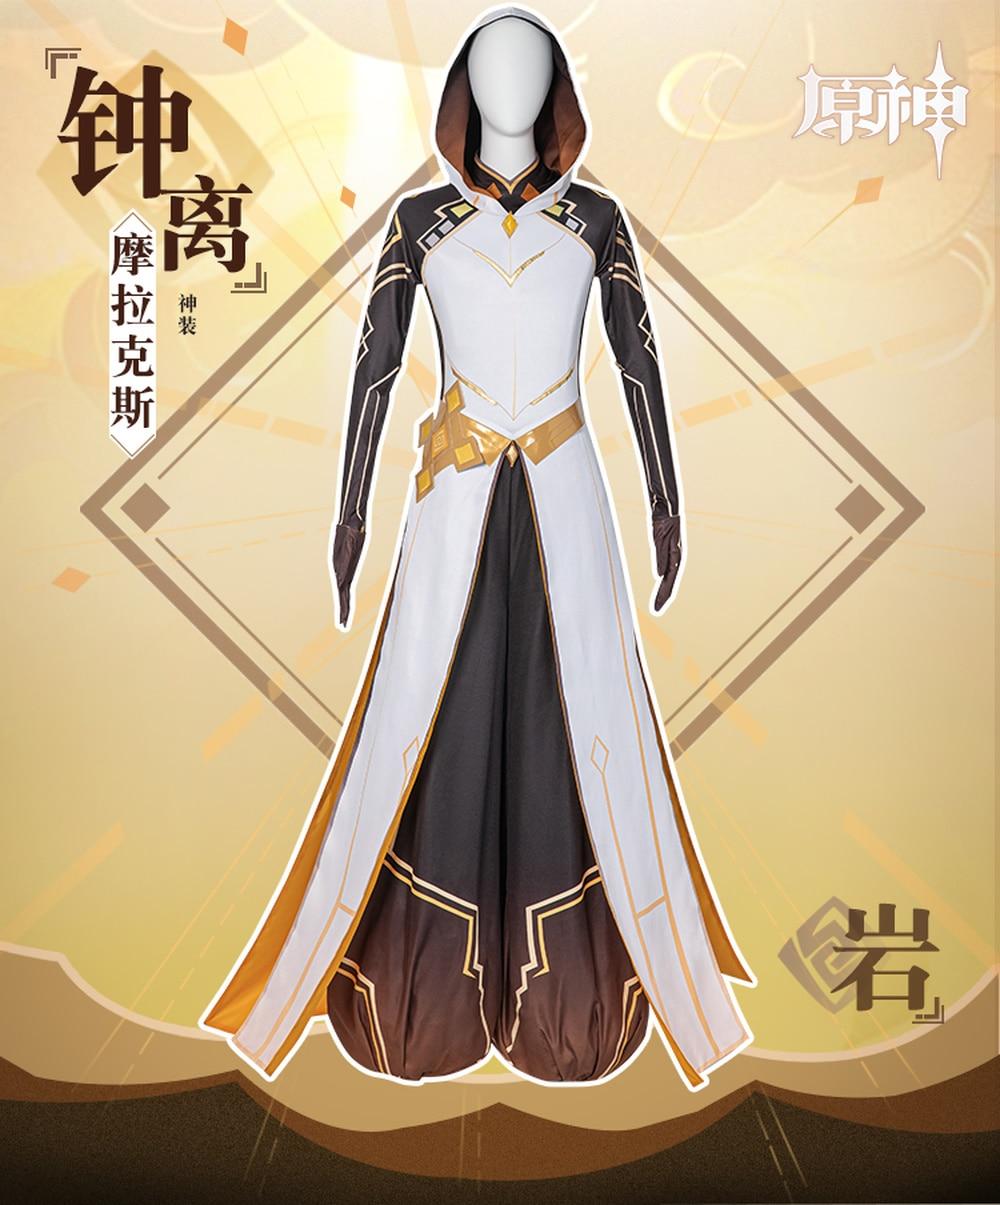 Traje para Halloween Festa de Natal Anime Genshin Impacto Zhongli Deus Traje Morax Masquerade Mostra